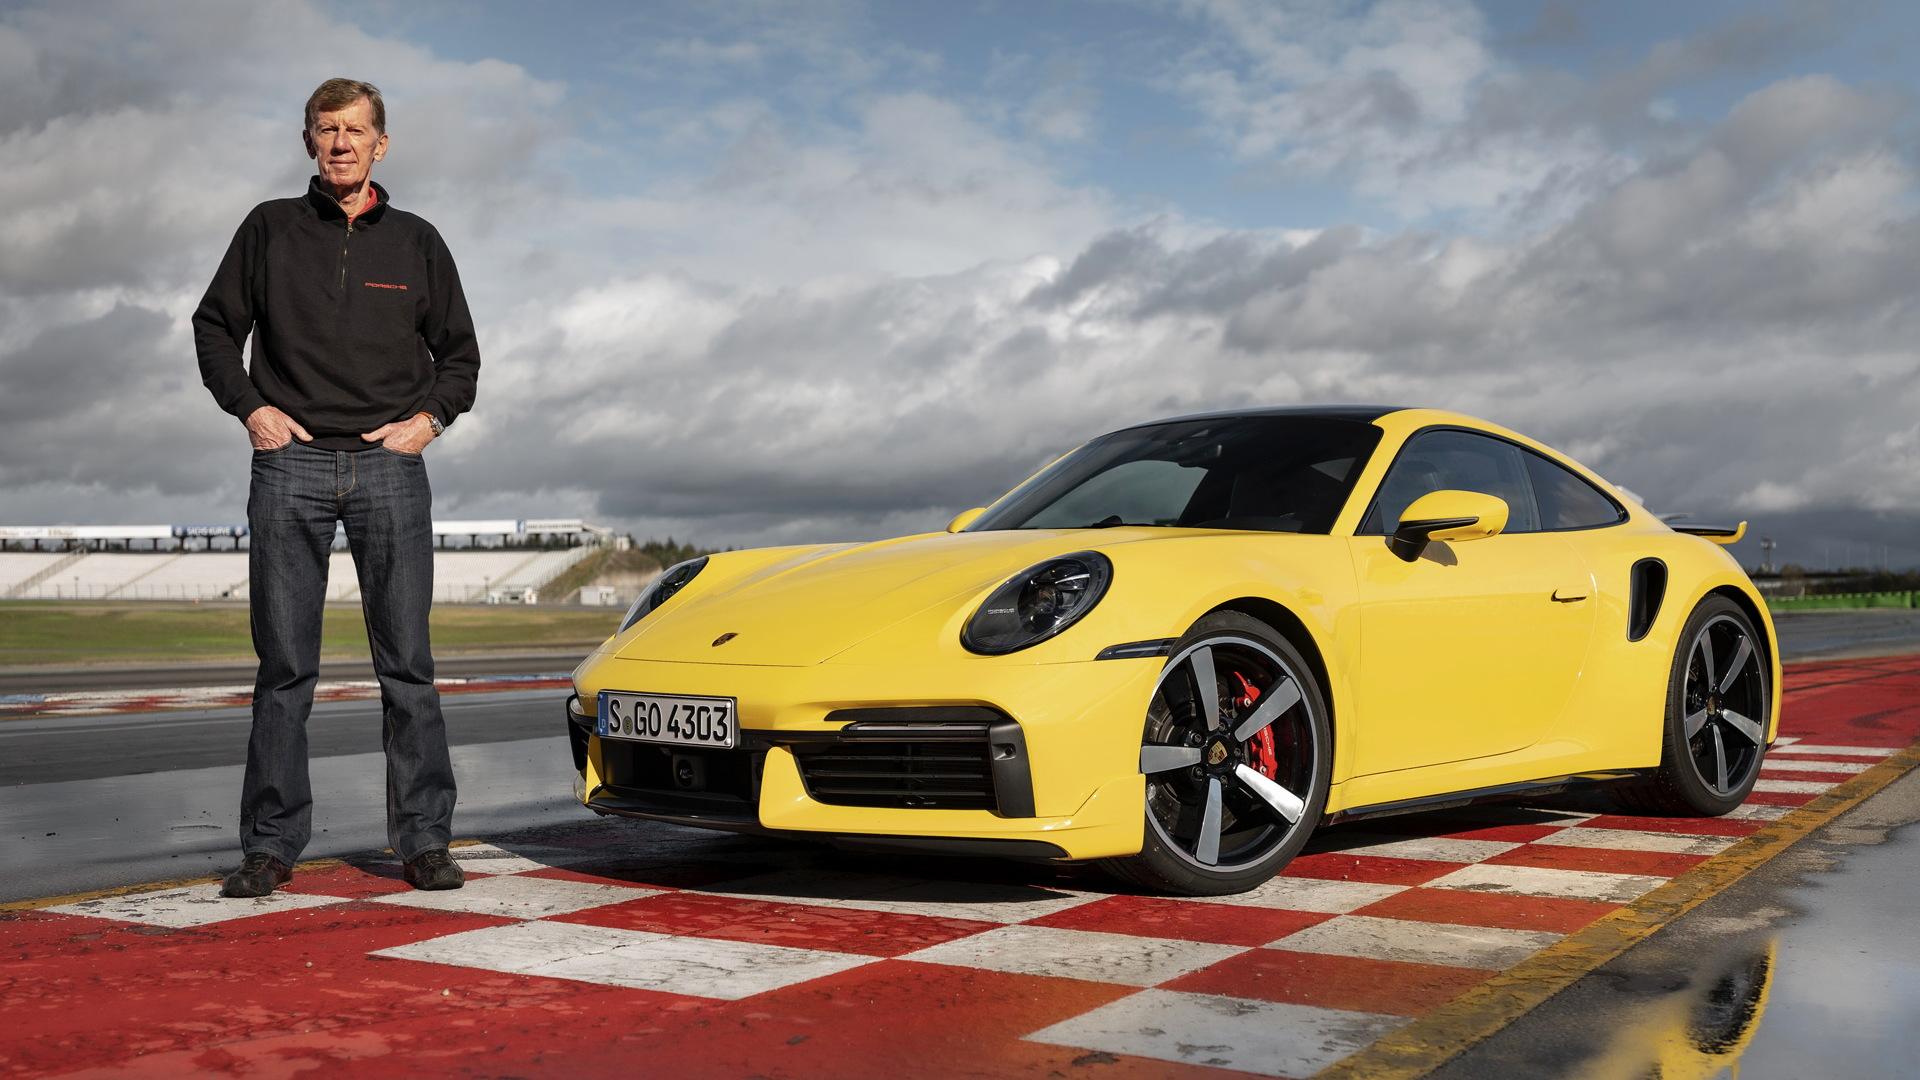 Walter Röhrl and the 992-generation Porsche 911 Turbo